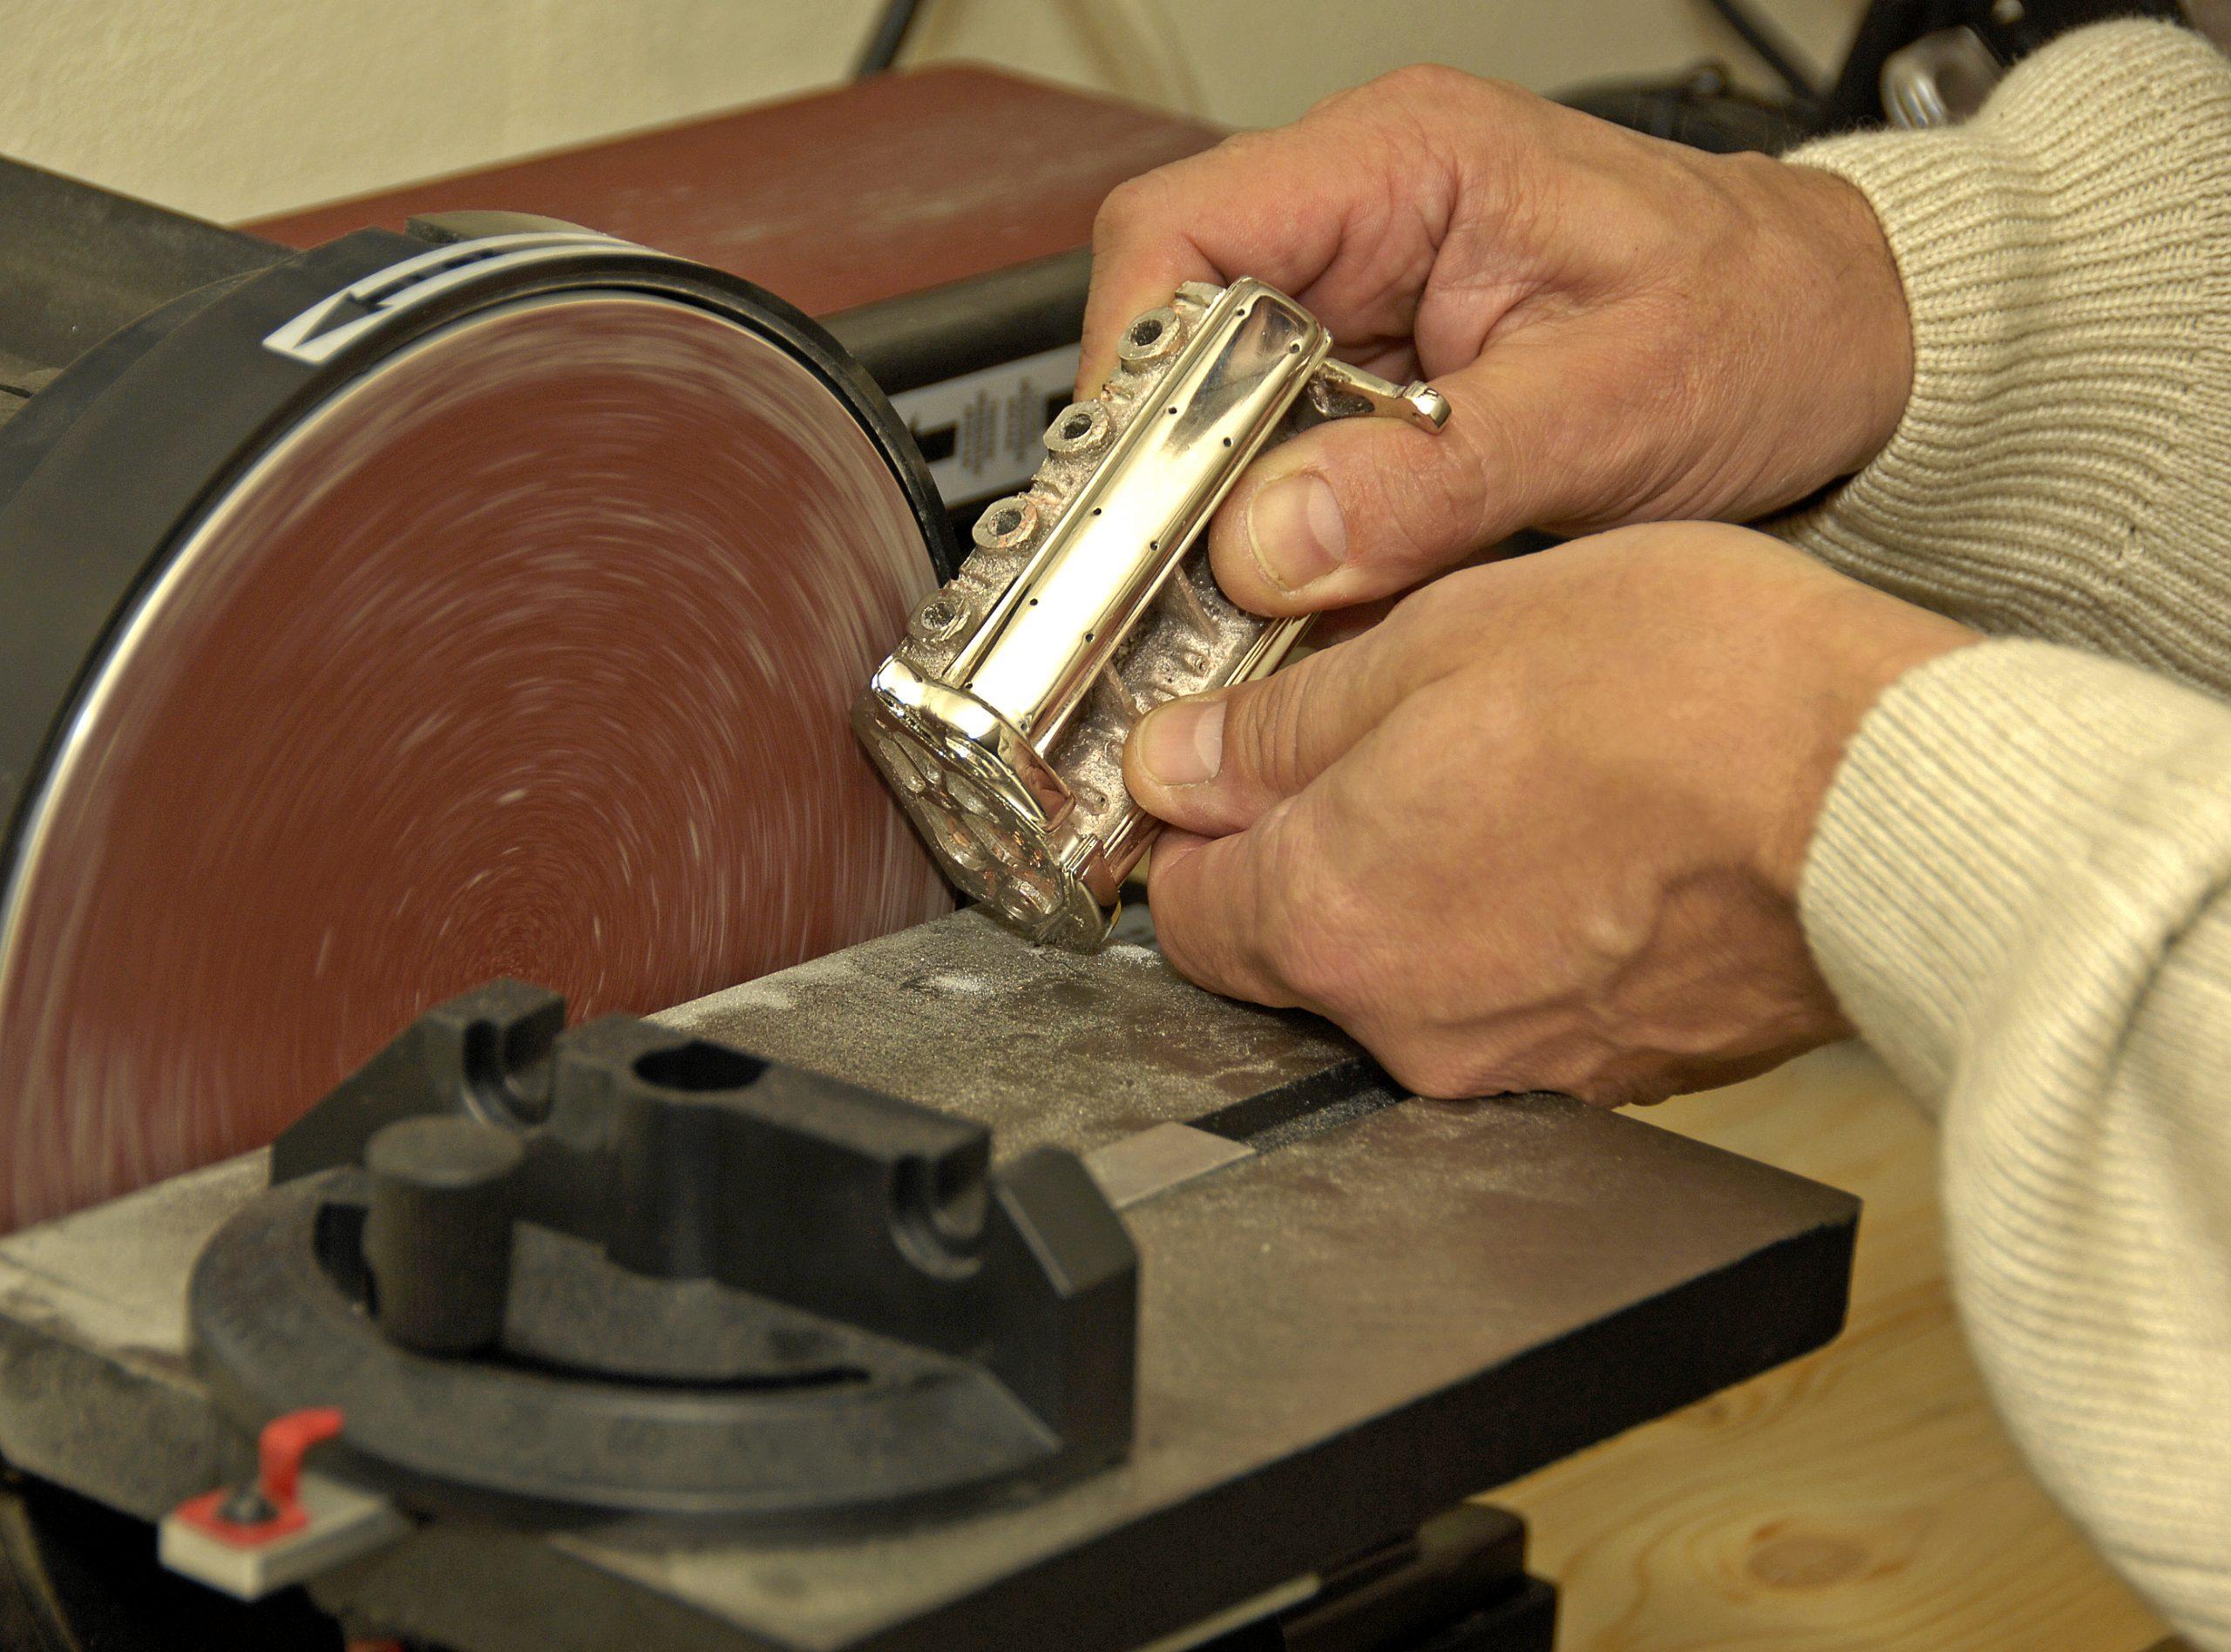 jorge sordelli belt sanding engine block